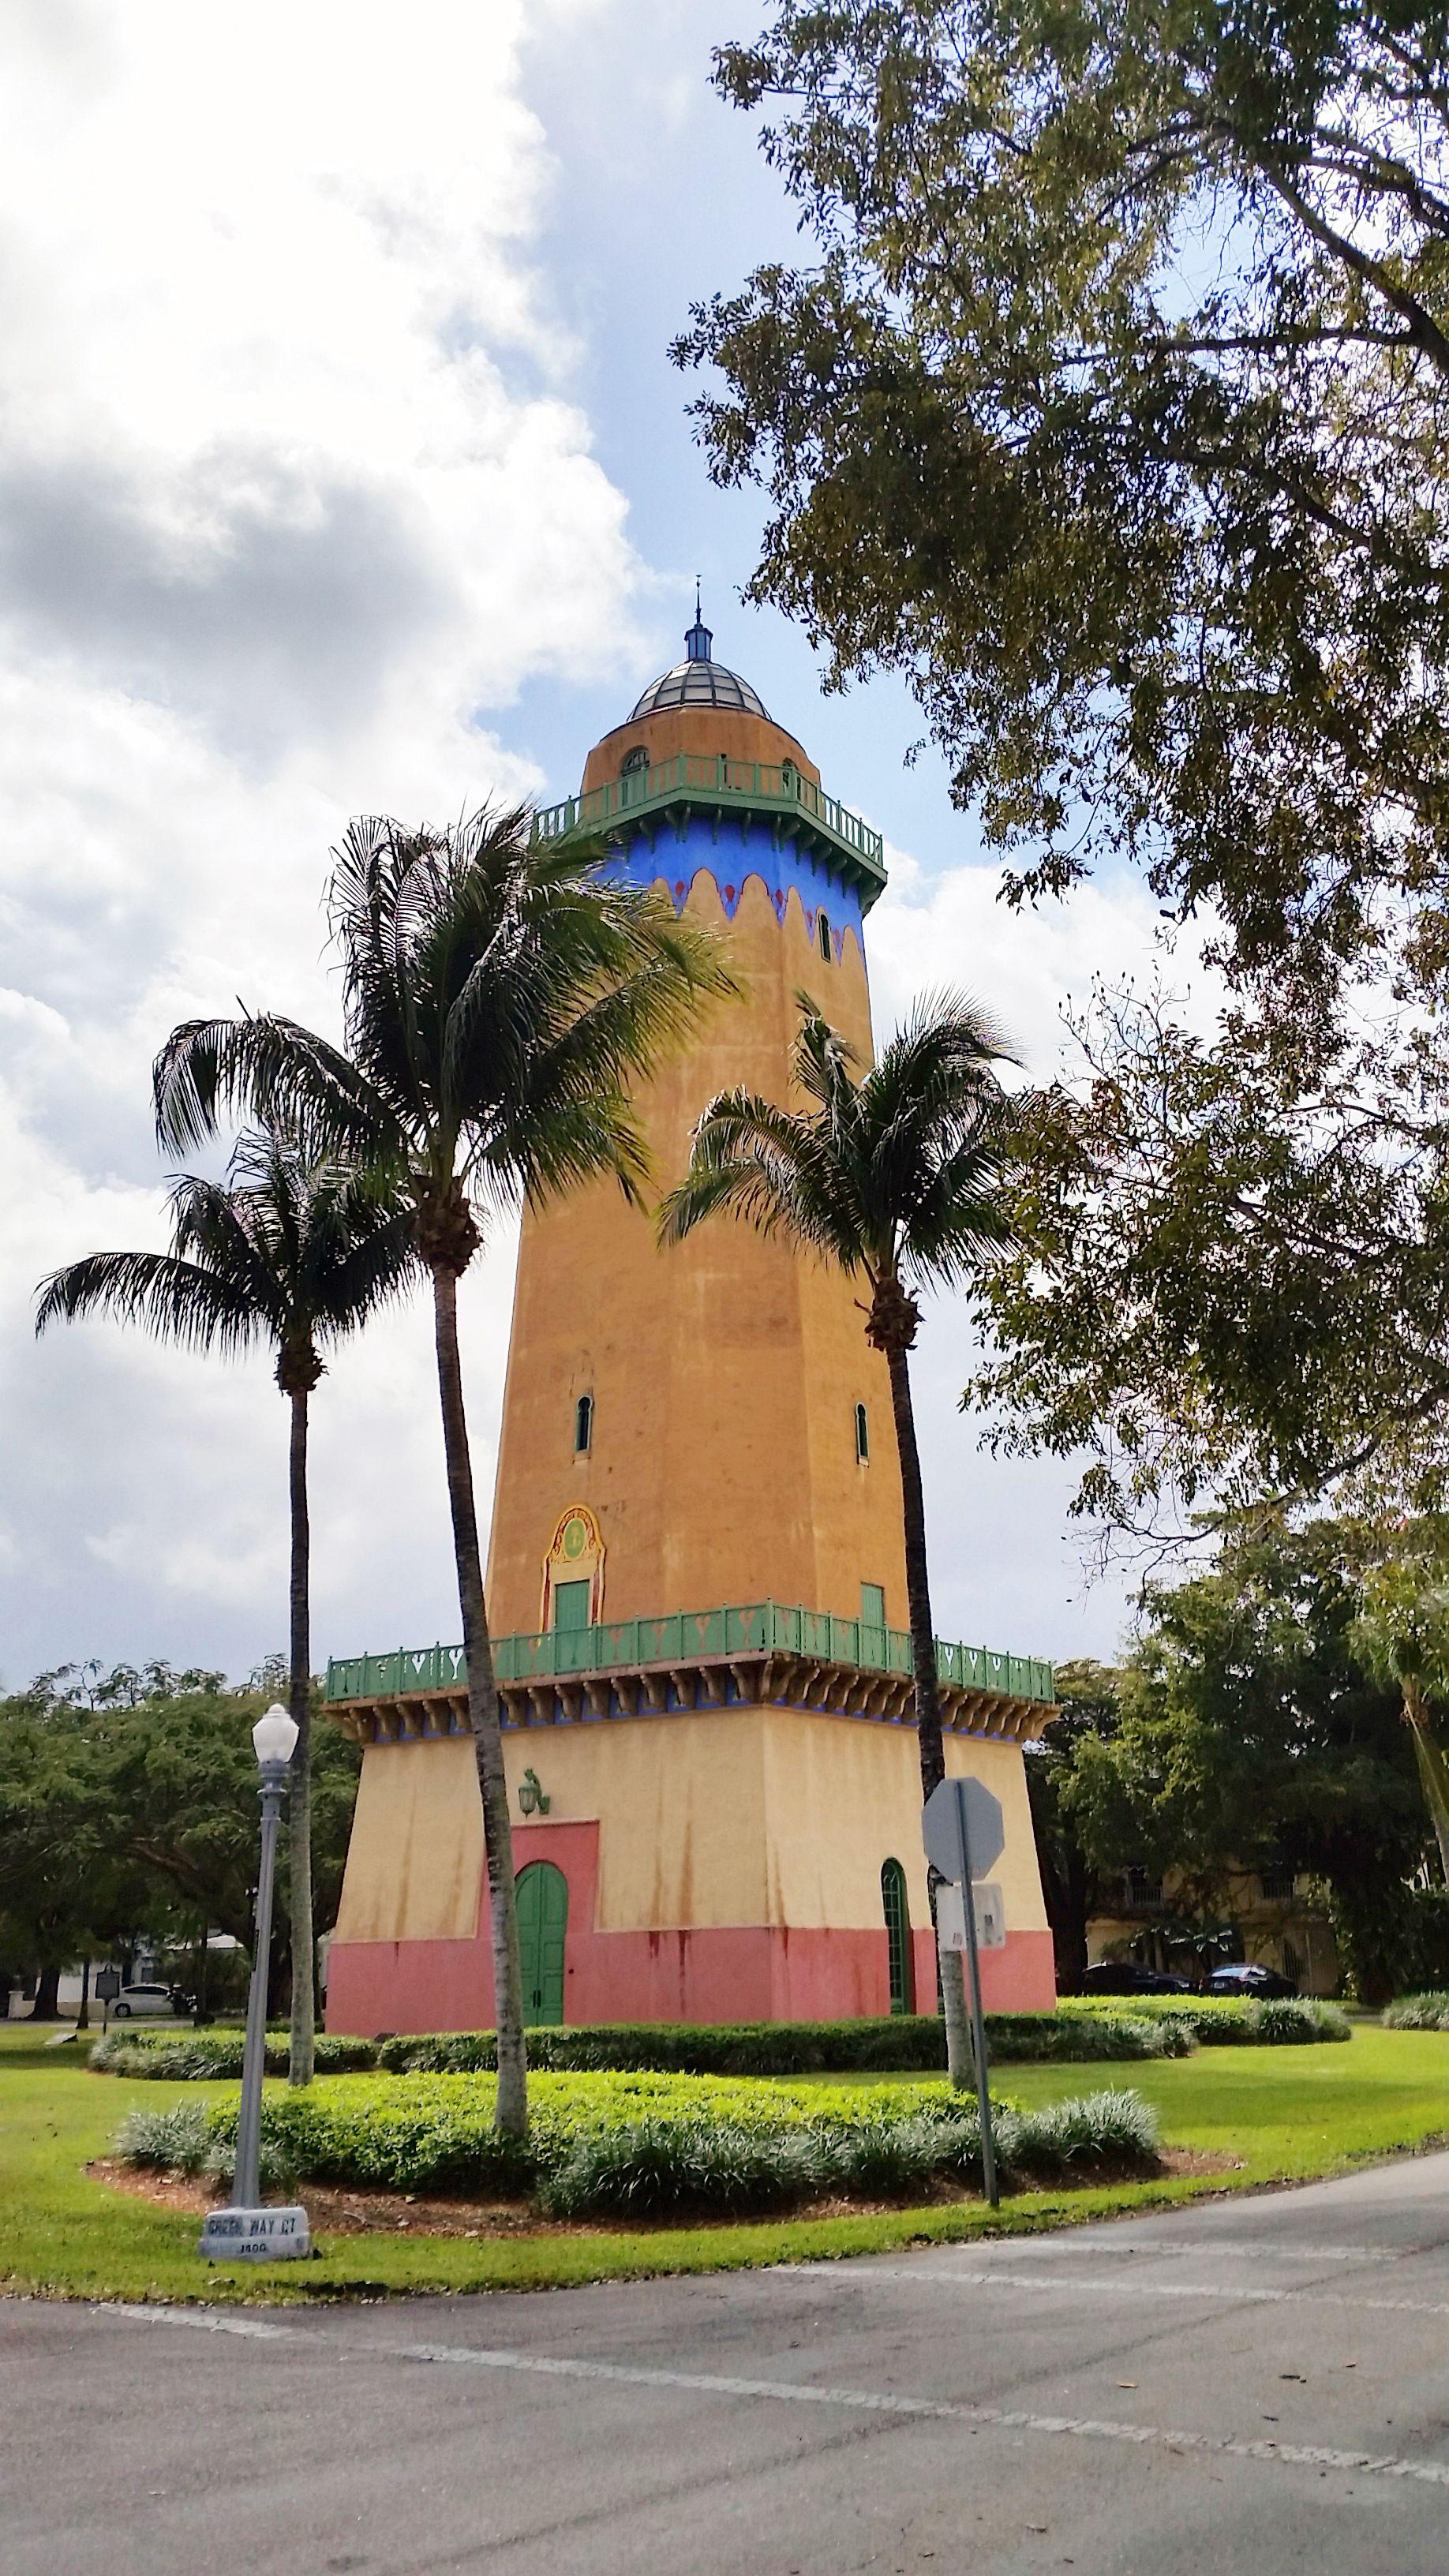 87ccb4d091c898a73b35656634b4e4c5 - Immigration Office In Miami Gardens Fl